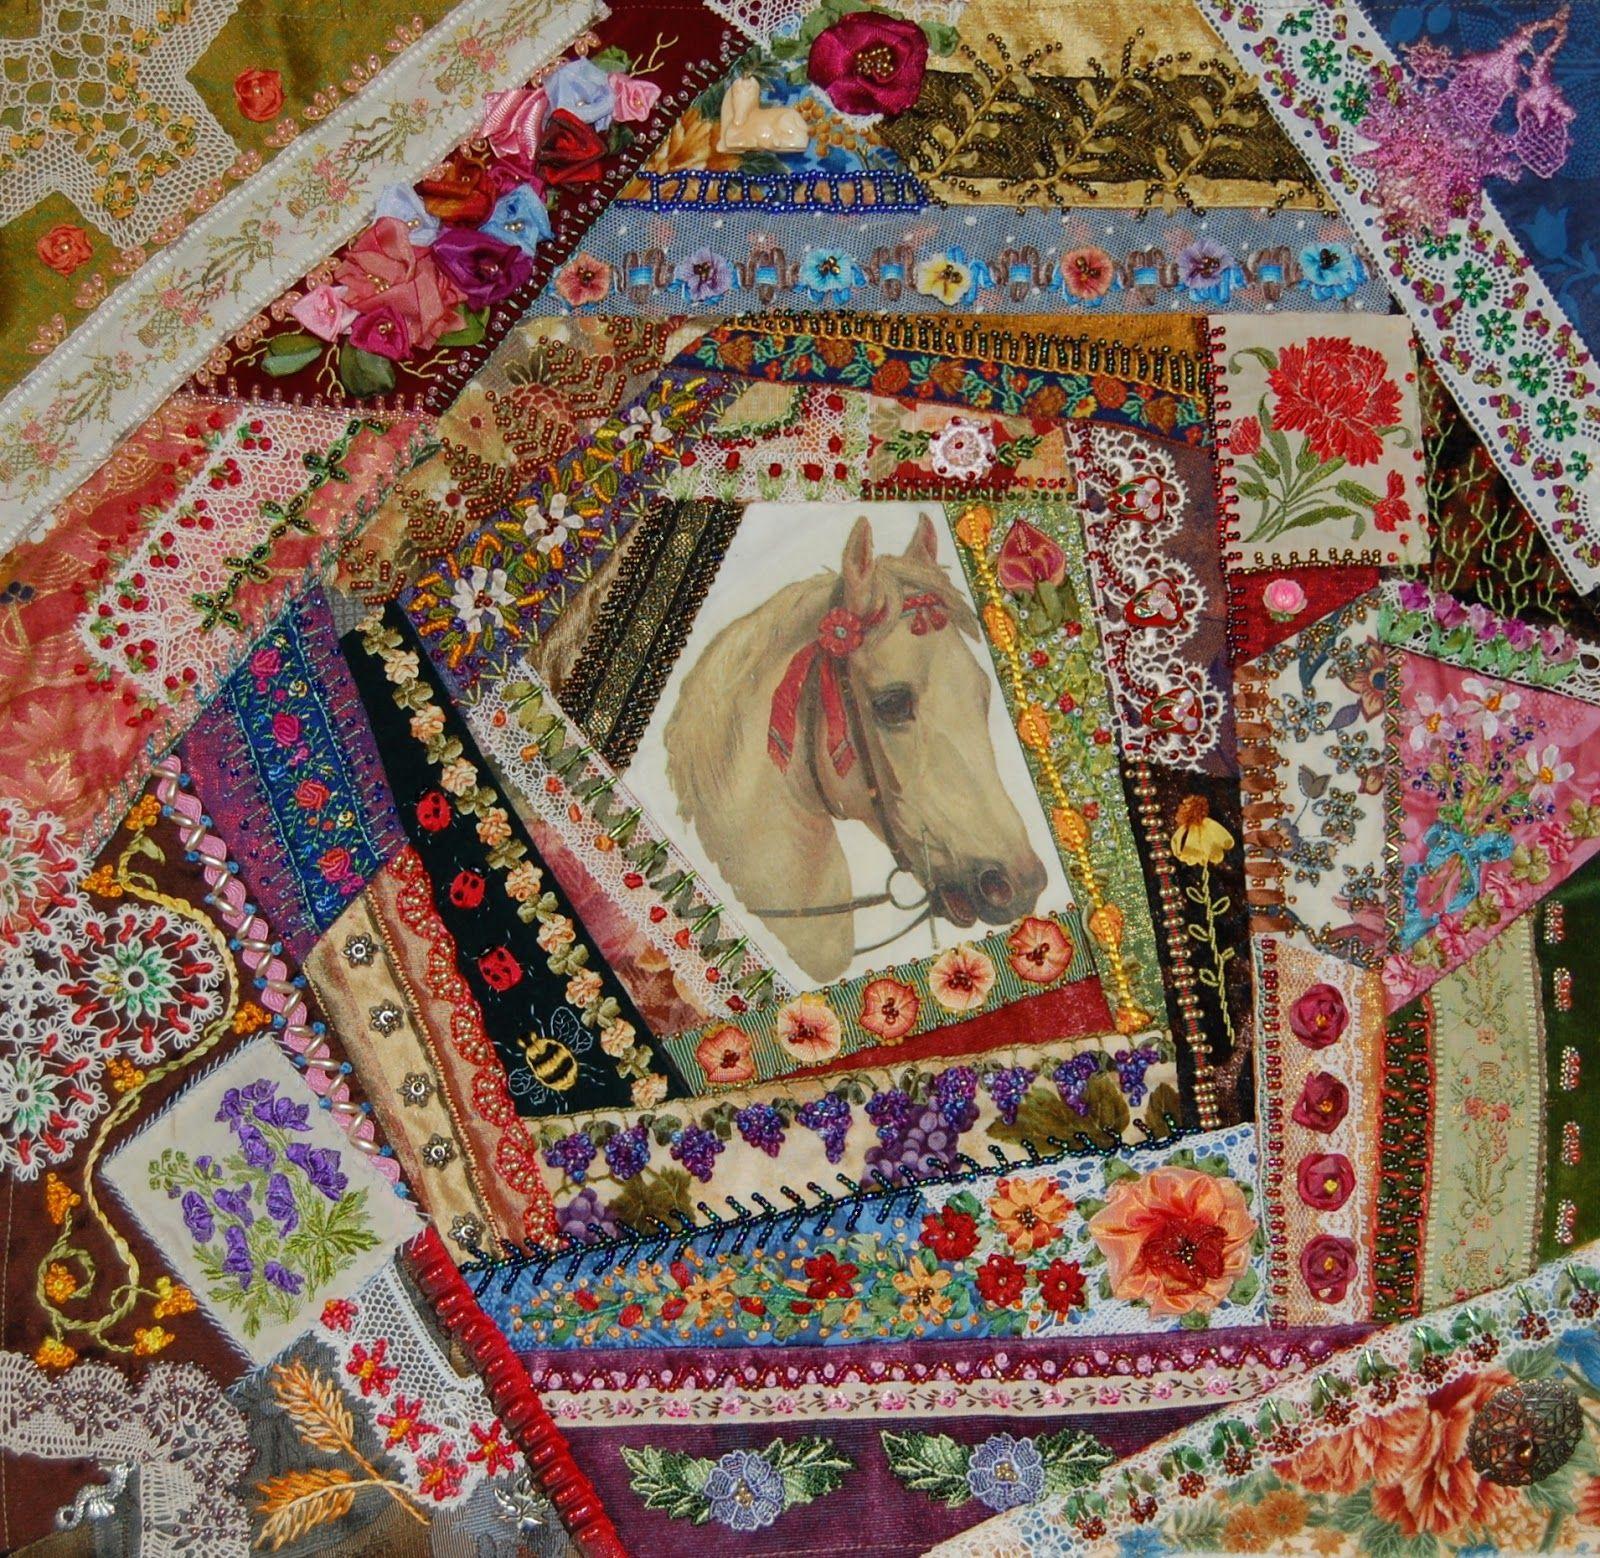 Crazy Quilt Pattern Images : Crazy Quilt Crazy Quilting Pinterest